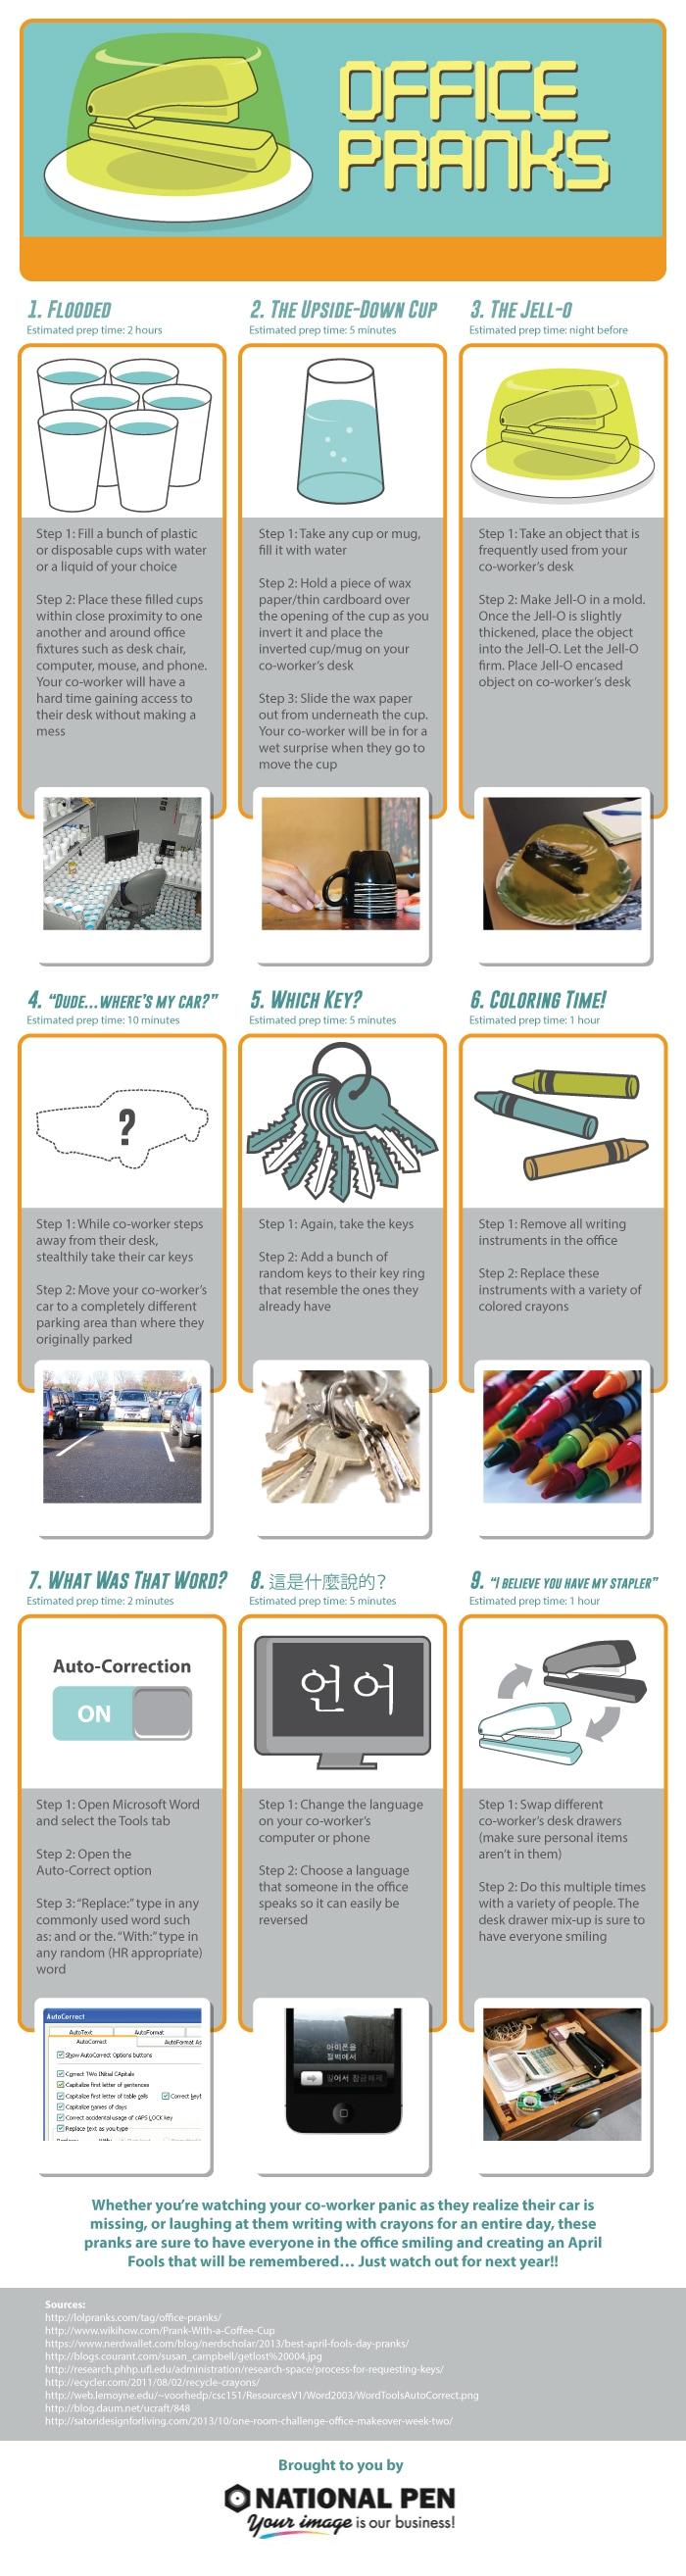 Office Pranks Infographic